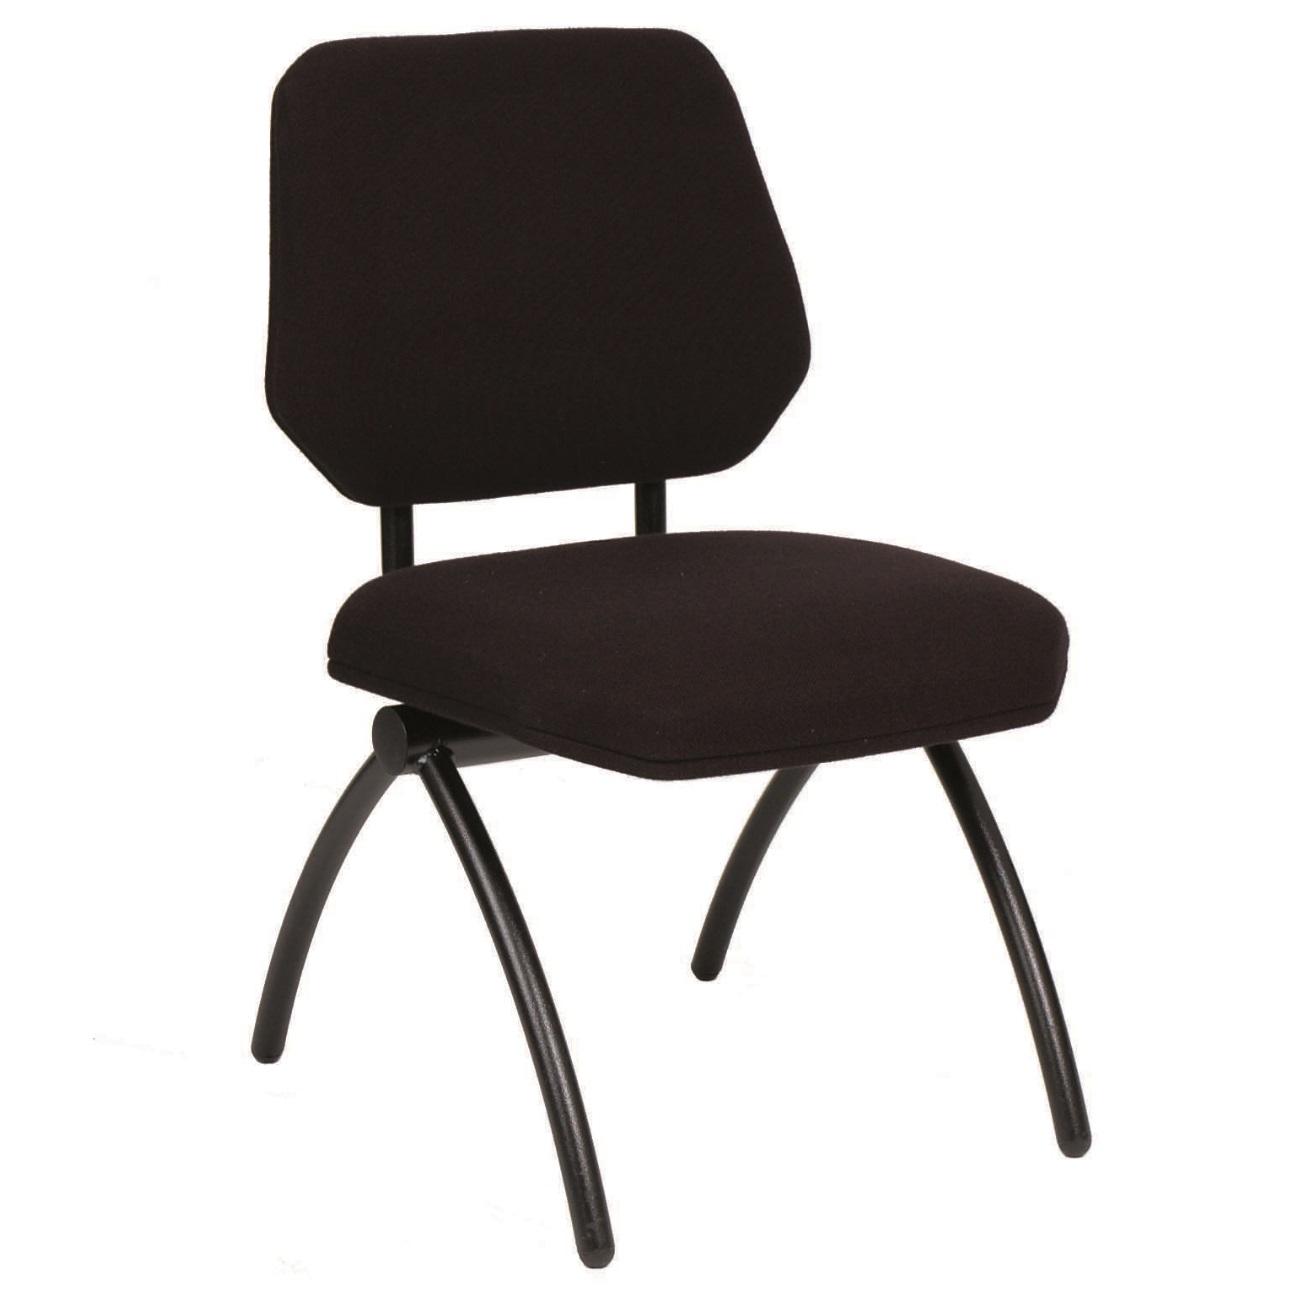 besucherstuhl patientenstuhl f r bergewichtige personen online sanit tshaus. Black Bedroom Furniture Sets. Home Design Ideas